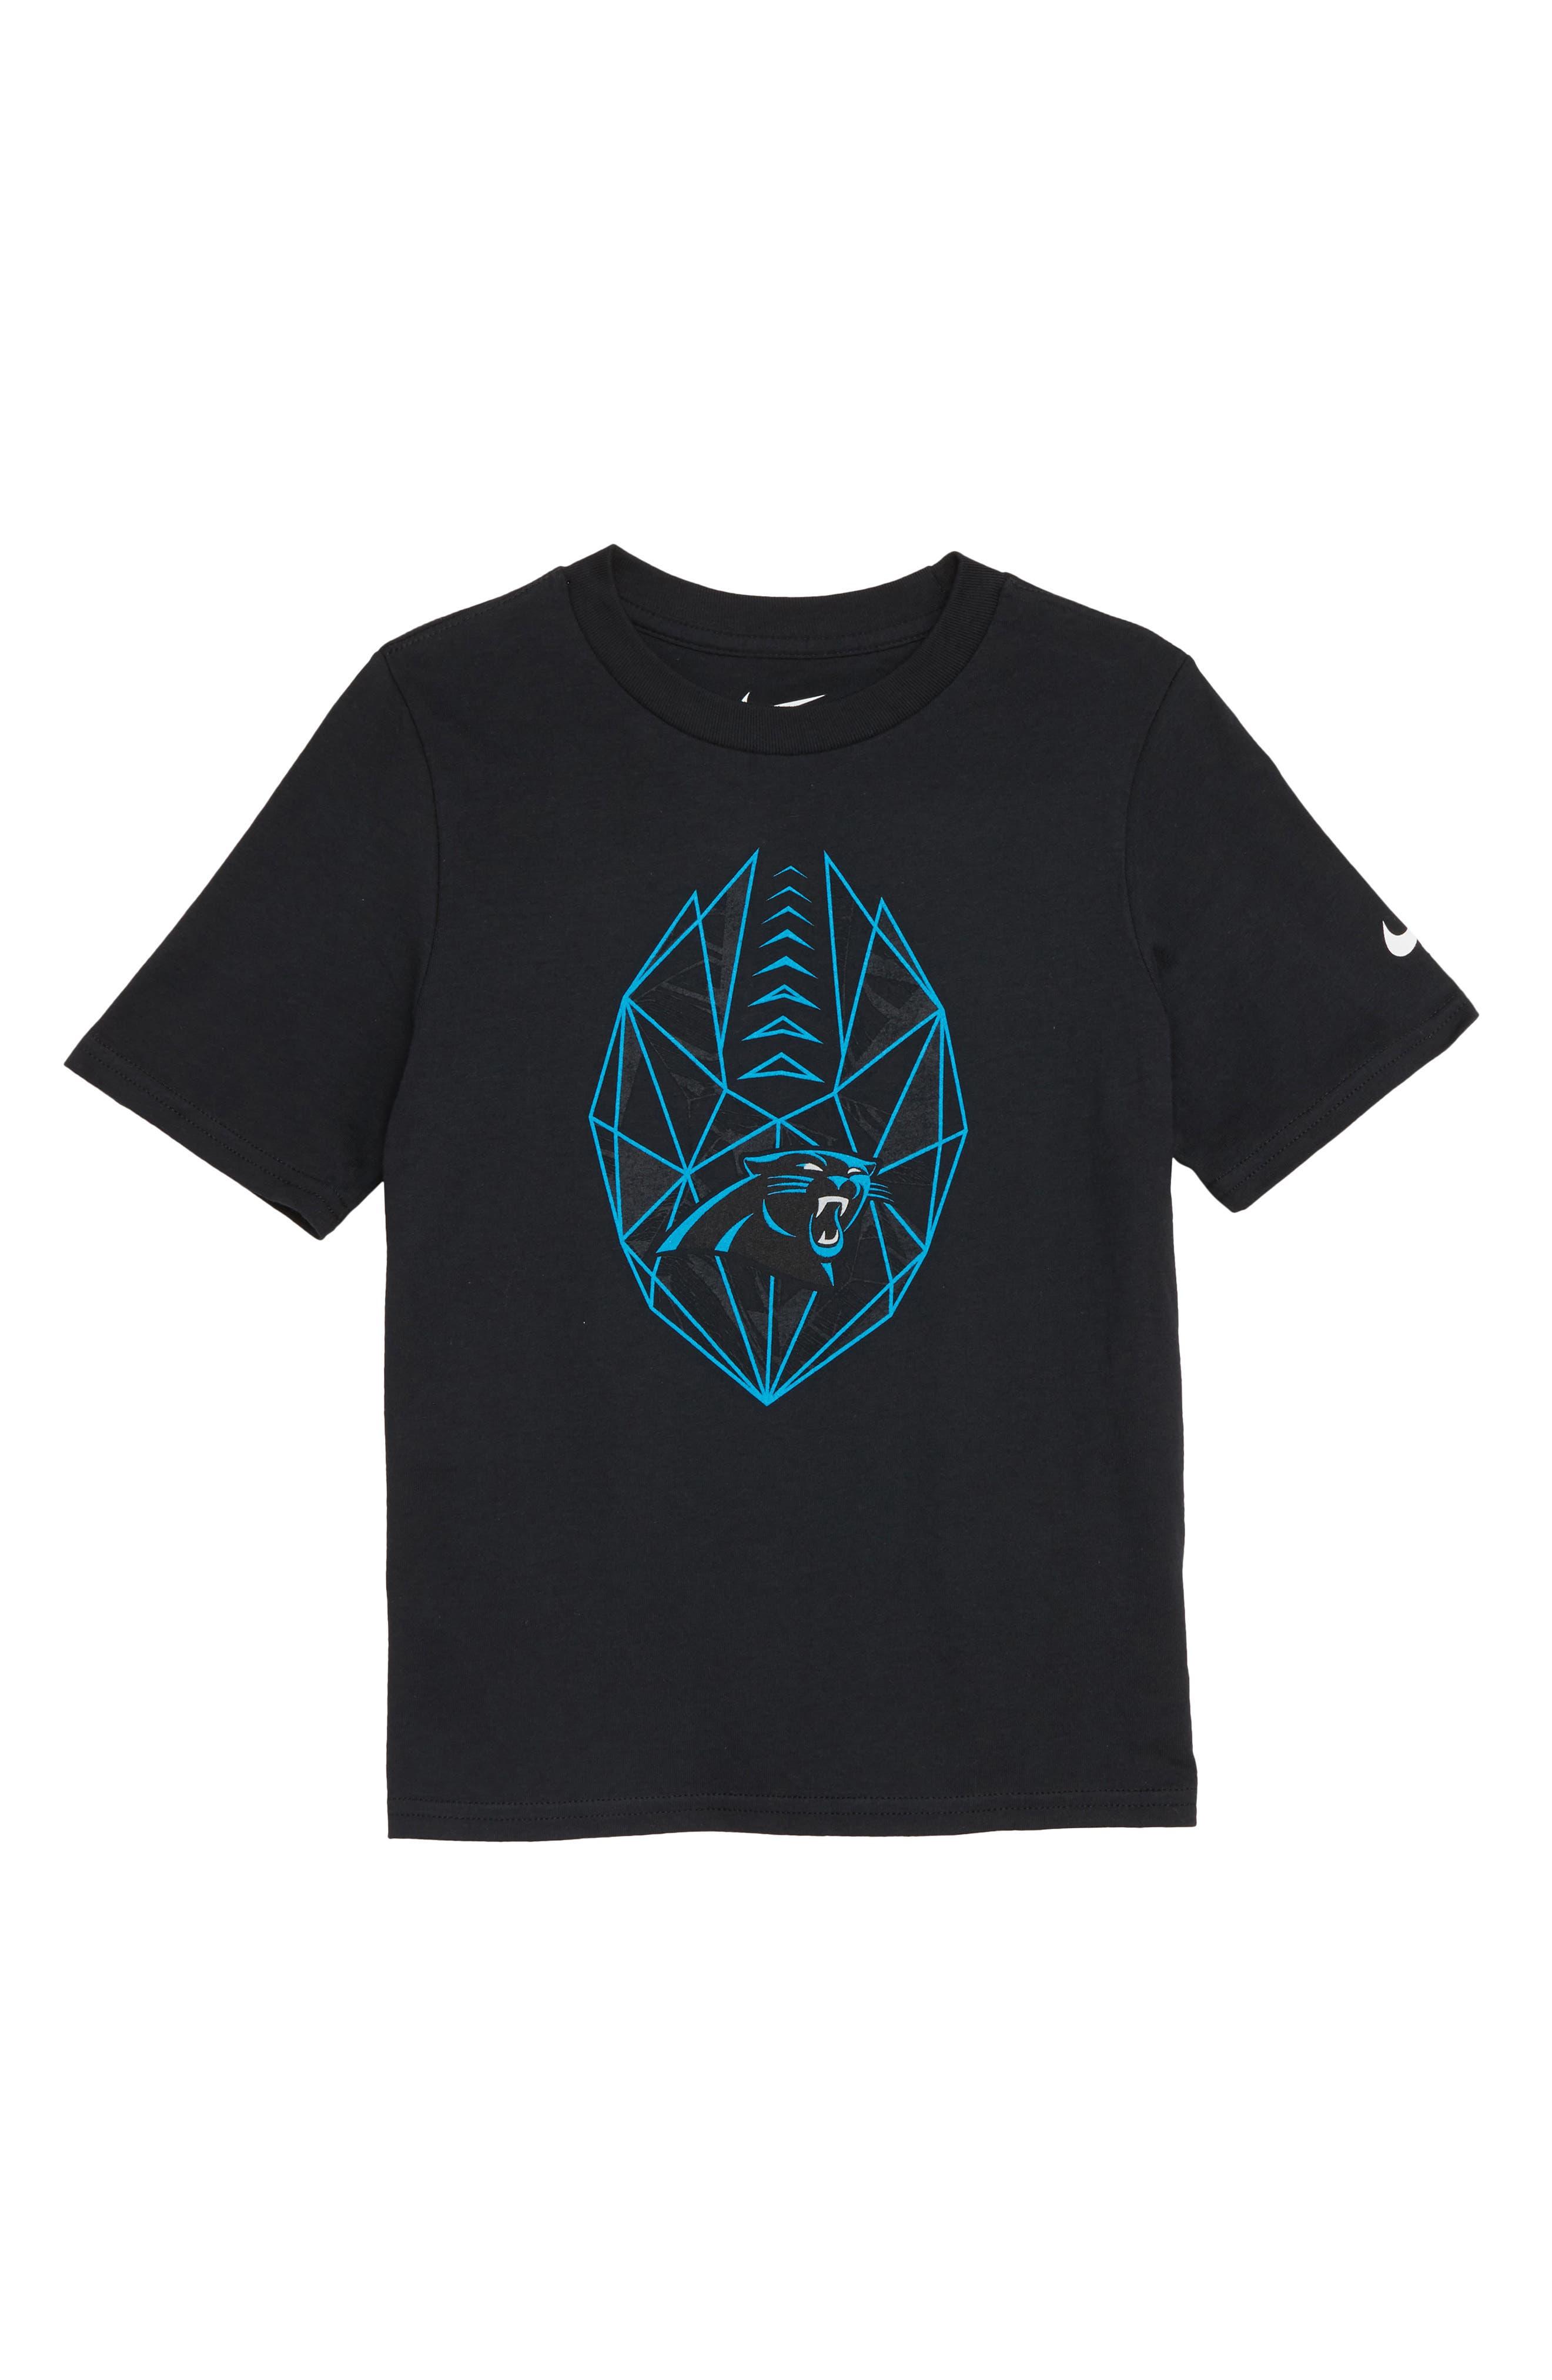 NFL Panthers T-Shirt,                             Main thumbnail 1, color,                             BLACK